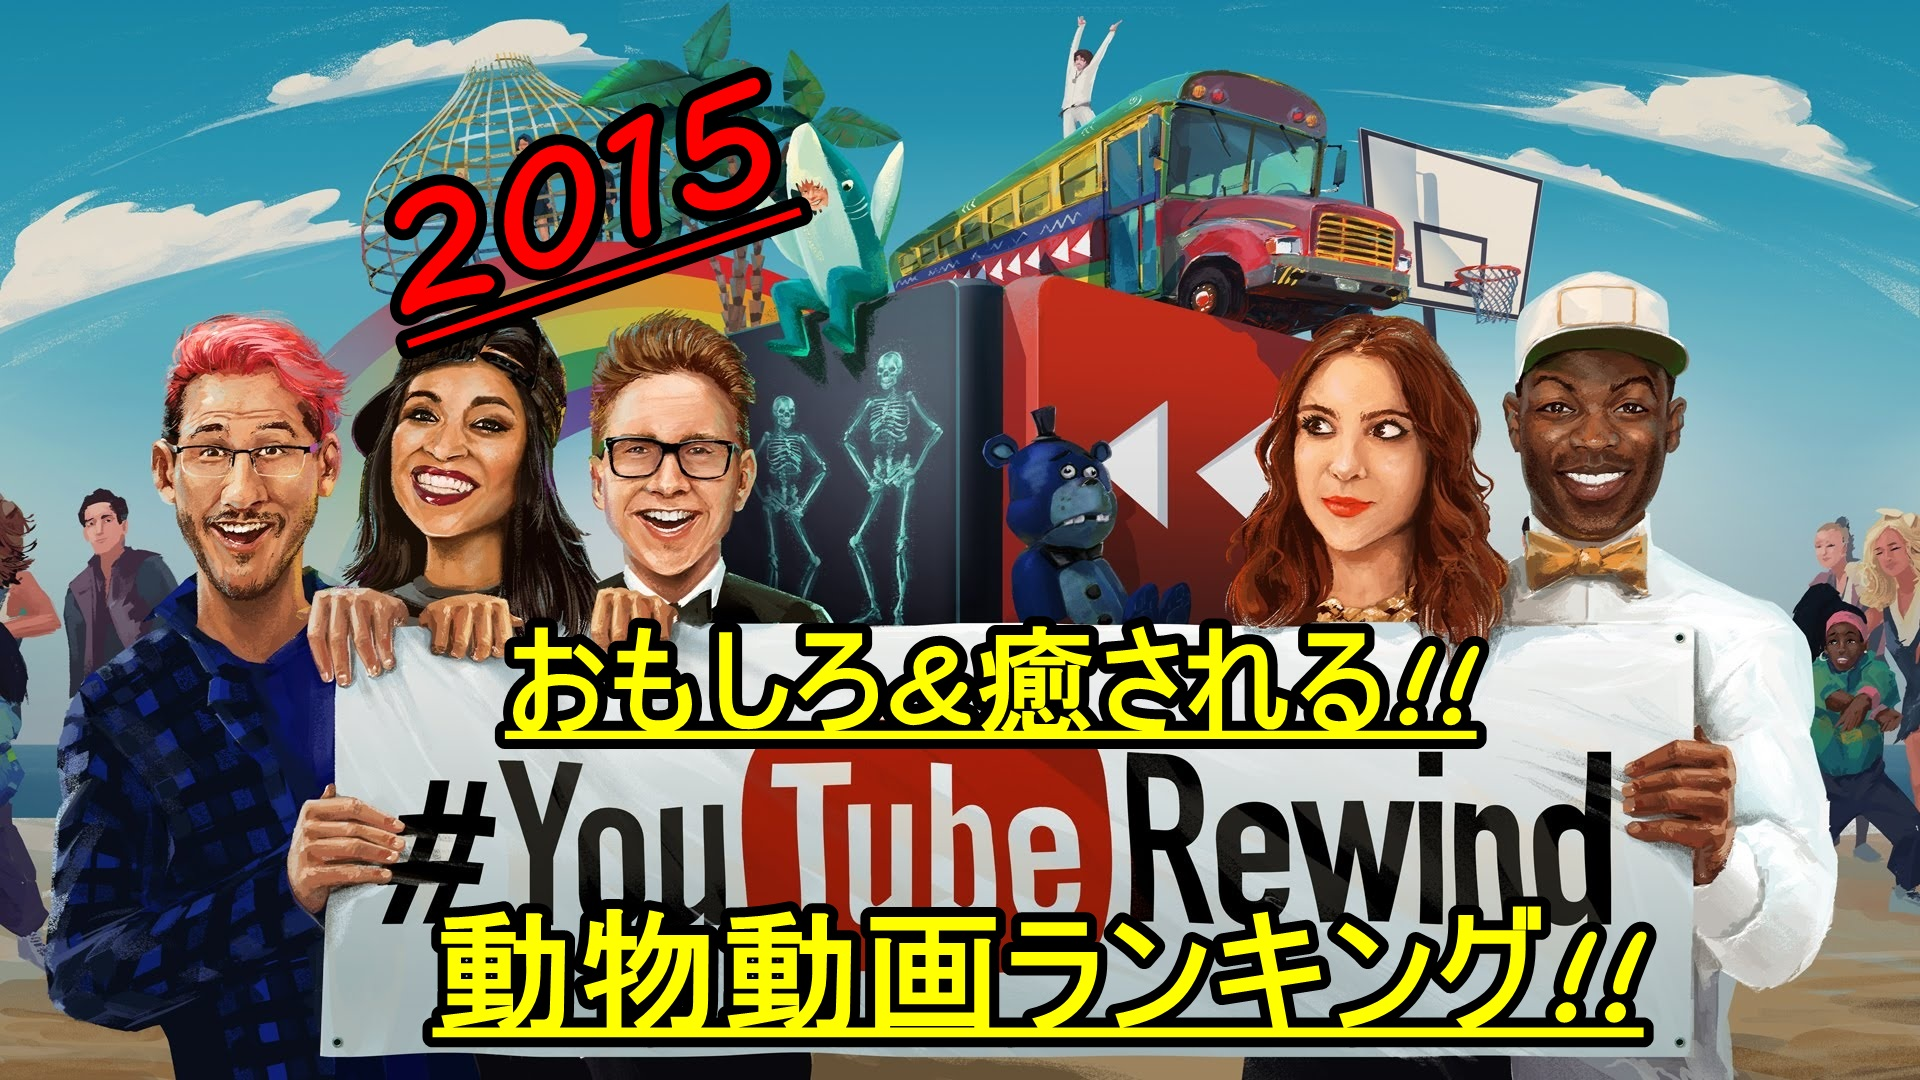 YouTube2015面白・癒し動画ランキング02